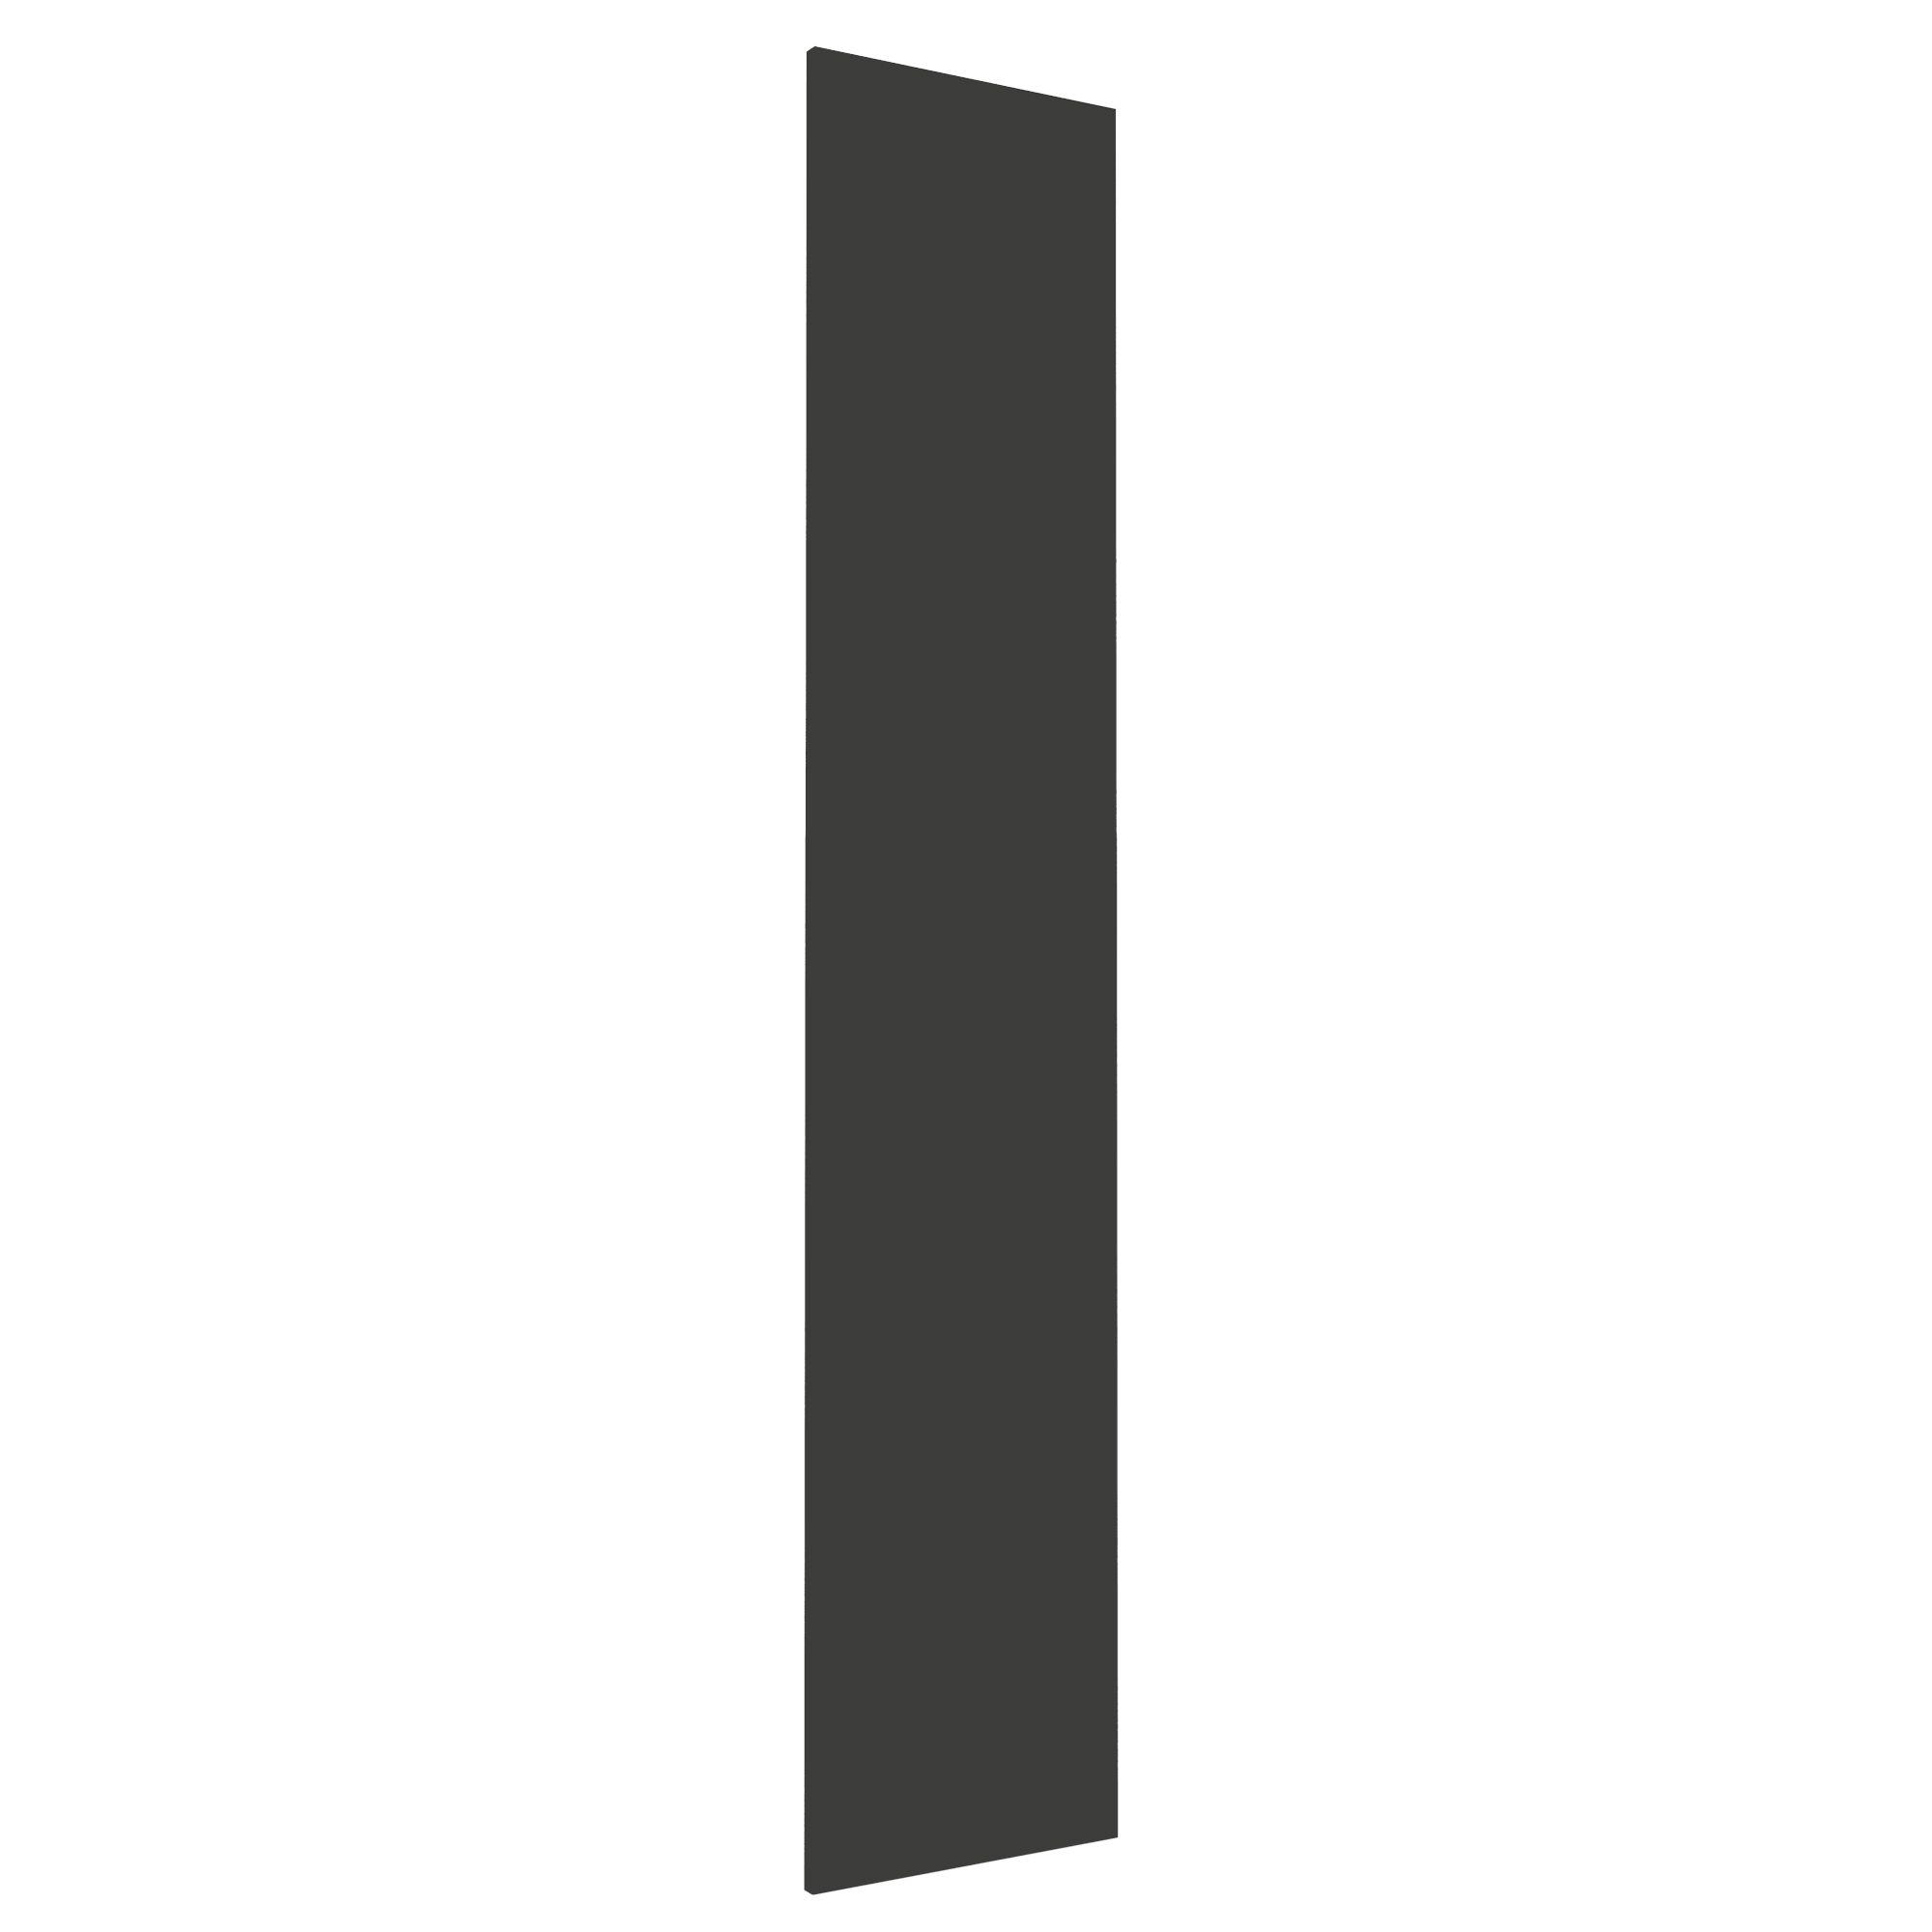 Darwin Modular Anthracite & Gloss Wardrobe Door (h)1808mm (w)372mm (d)18mm